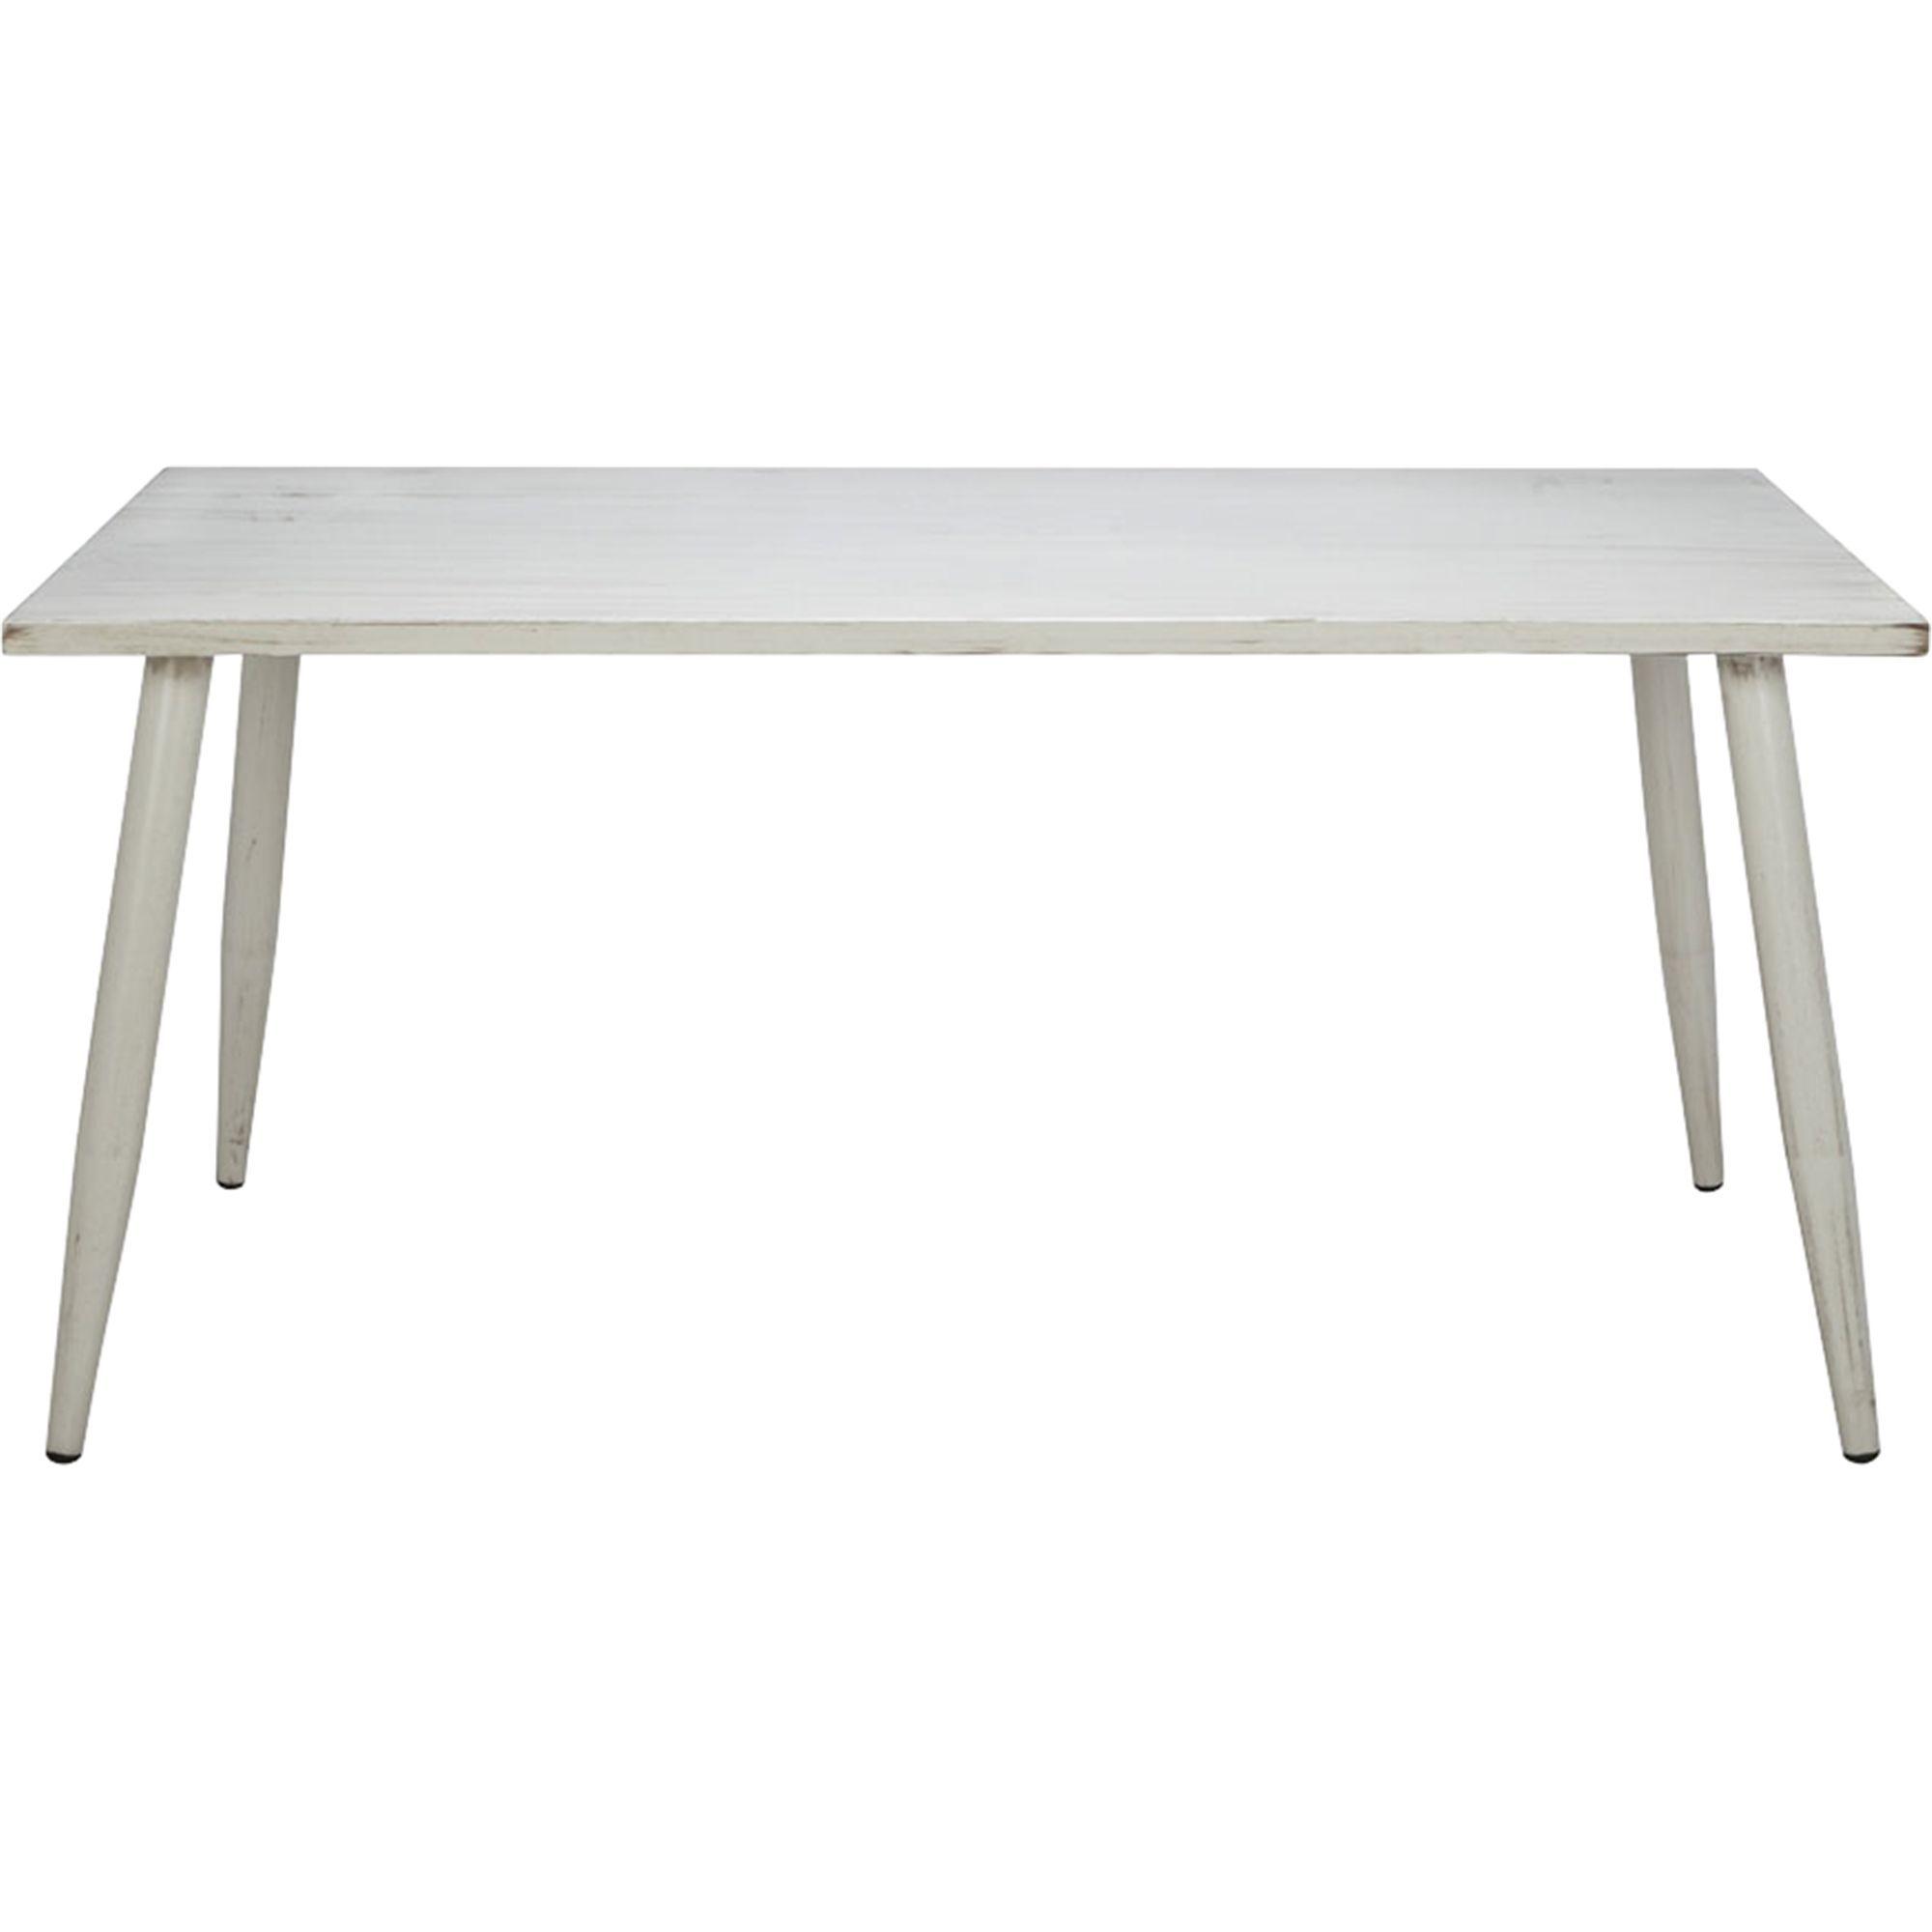 alinea : audrey table de jardin écrue en aluminium (6 places ...